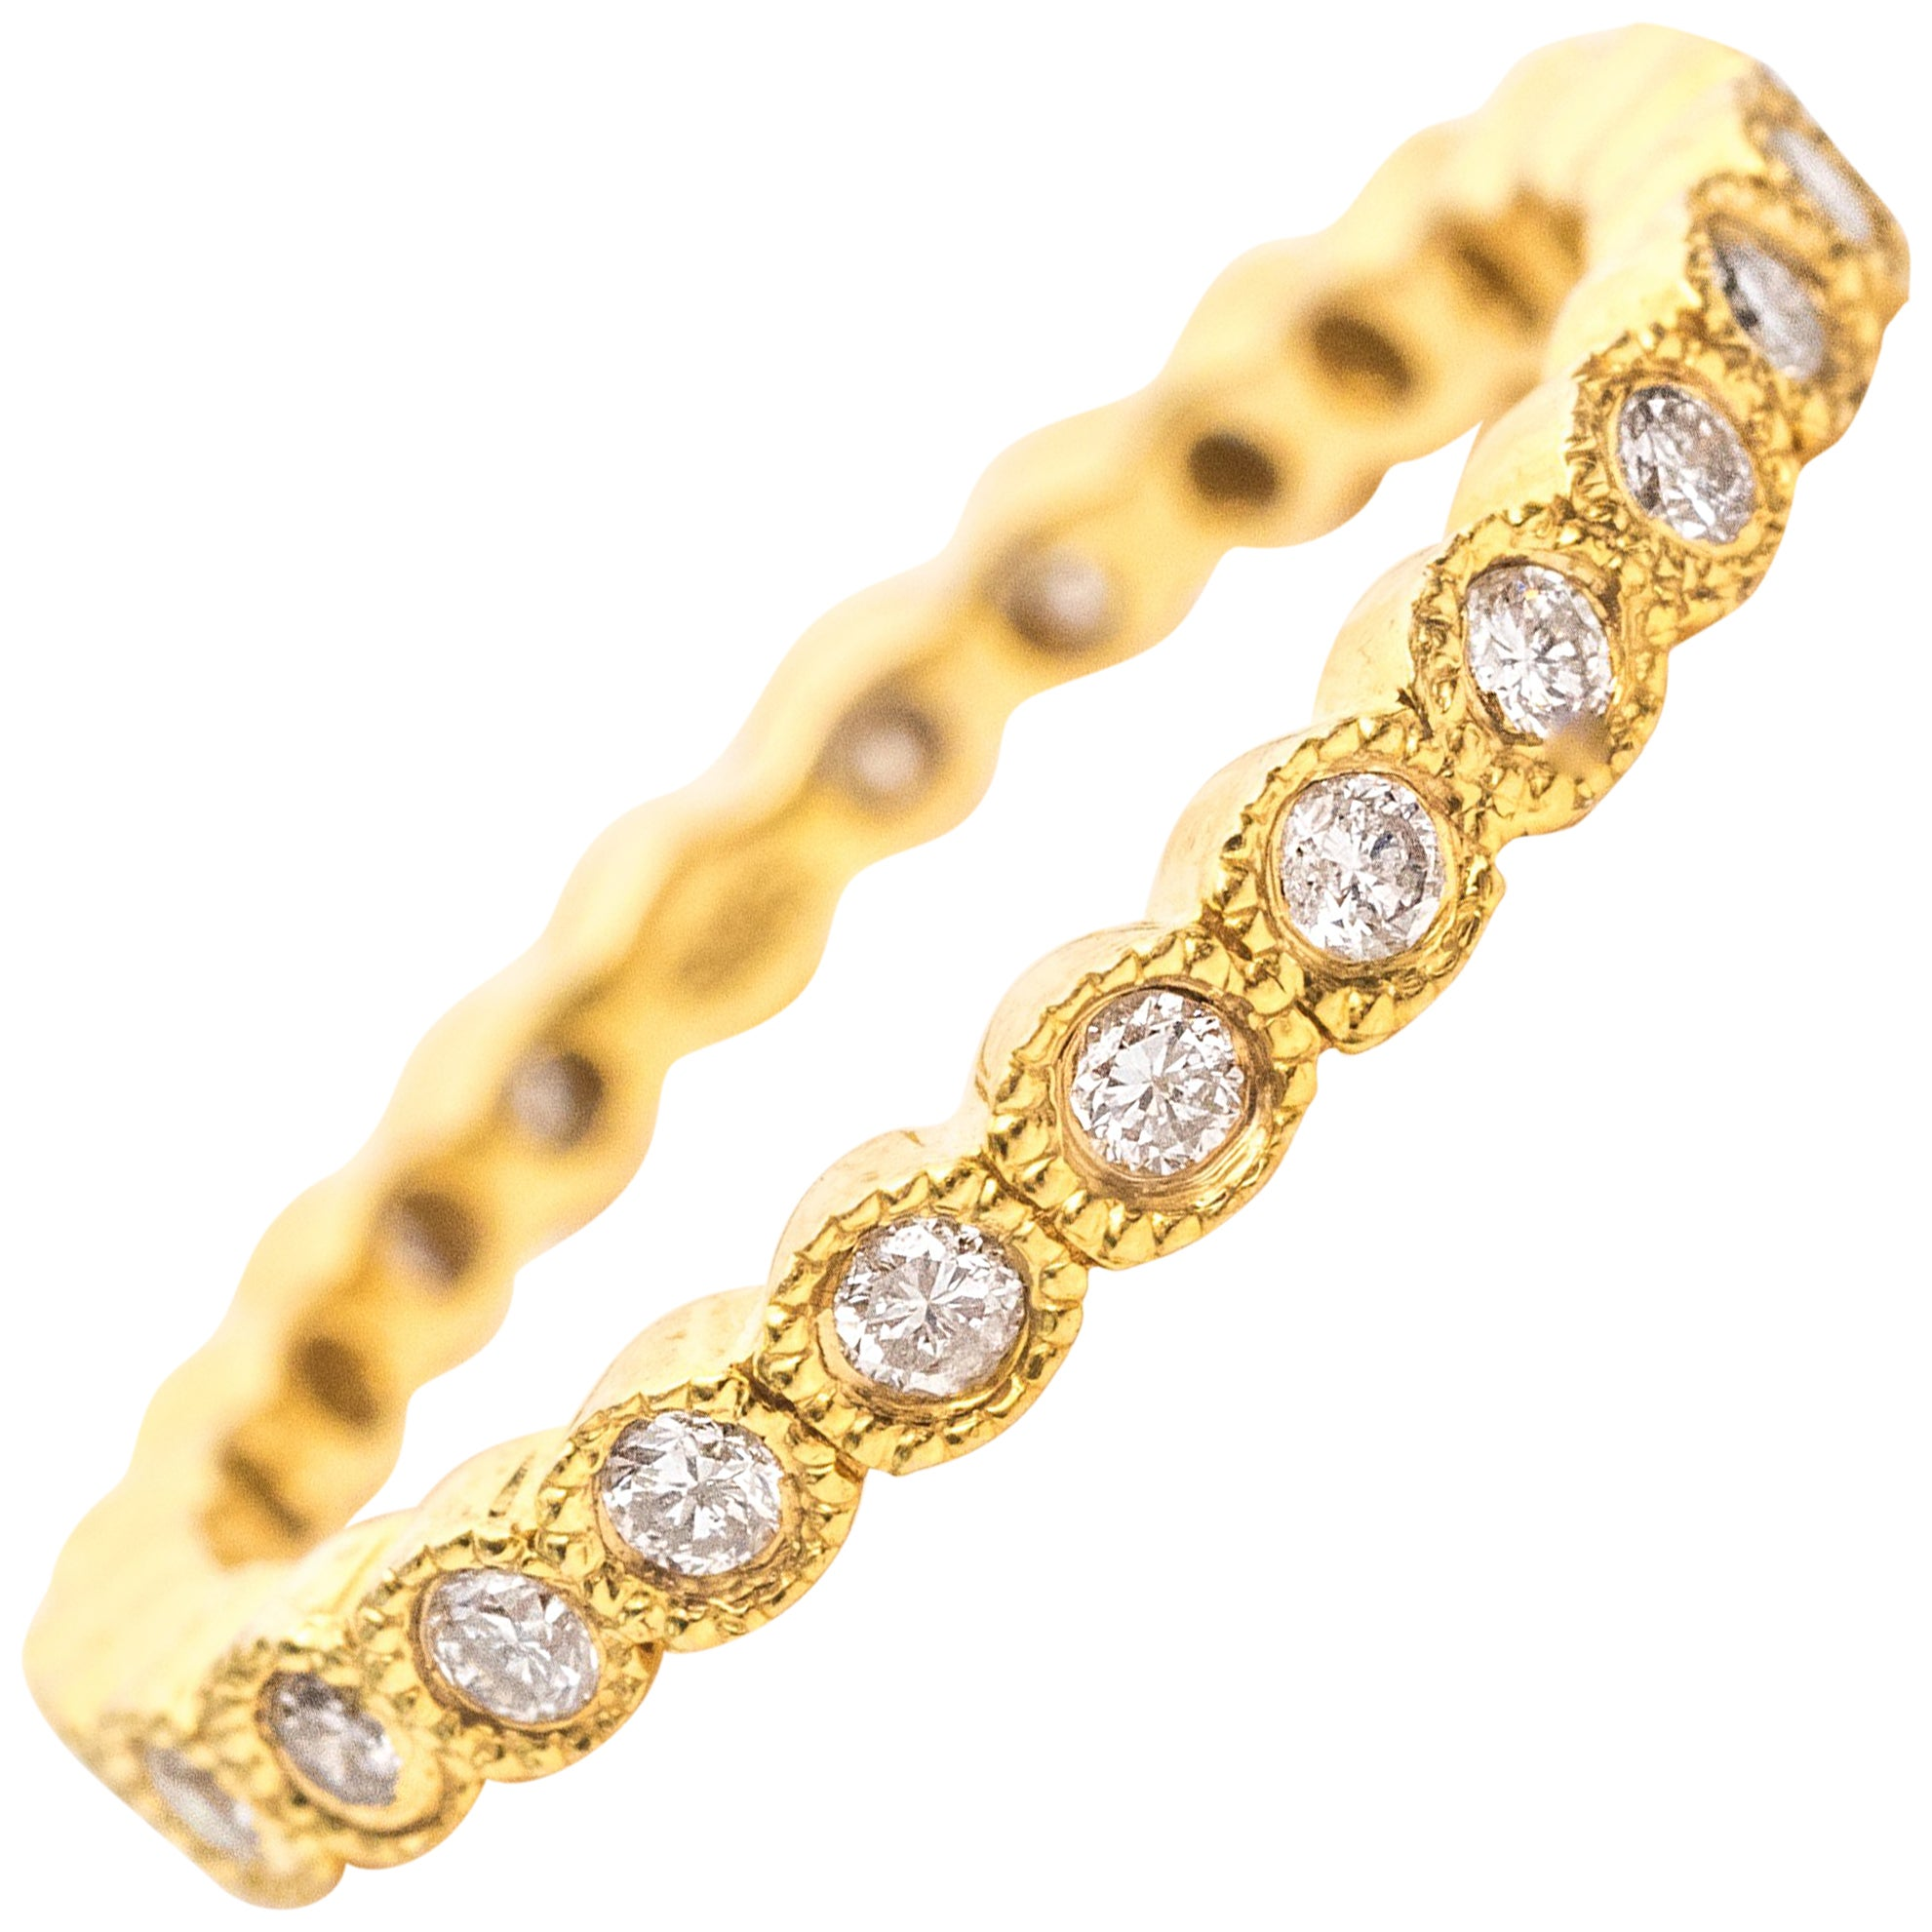 1990s Diamond and 14 Karat Yellow Gold Eternity Band Ring